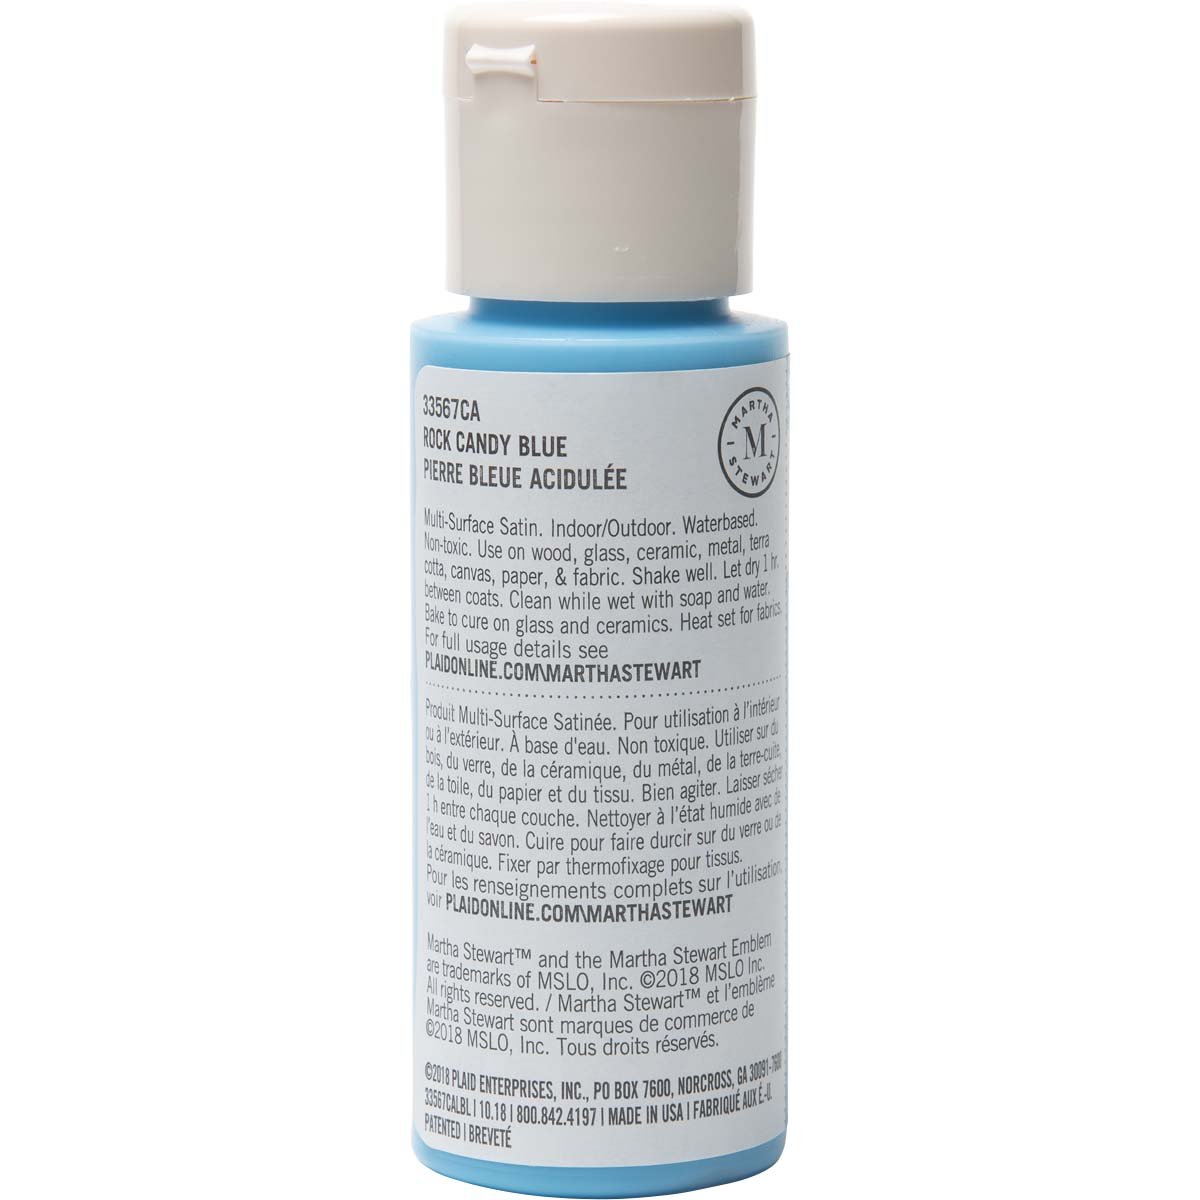 Martha Stewart® 2oz Multi-Surface Satin Acrylic Craft Paint - Rock Candy Blue